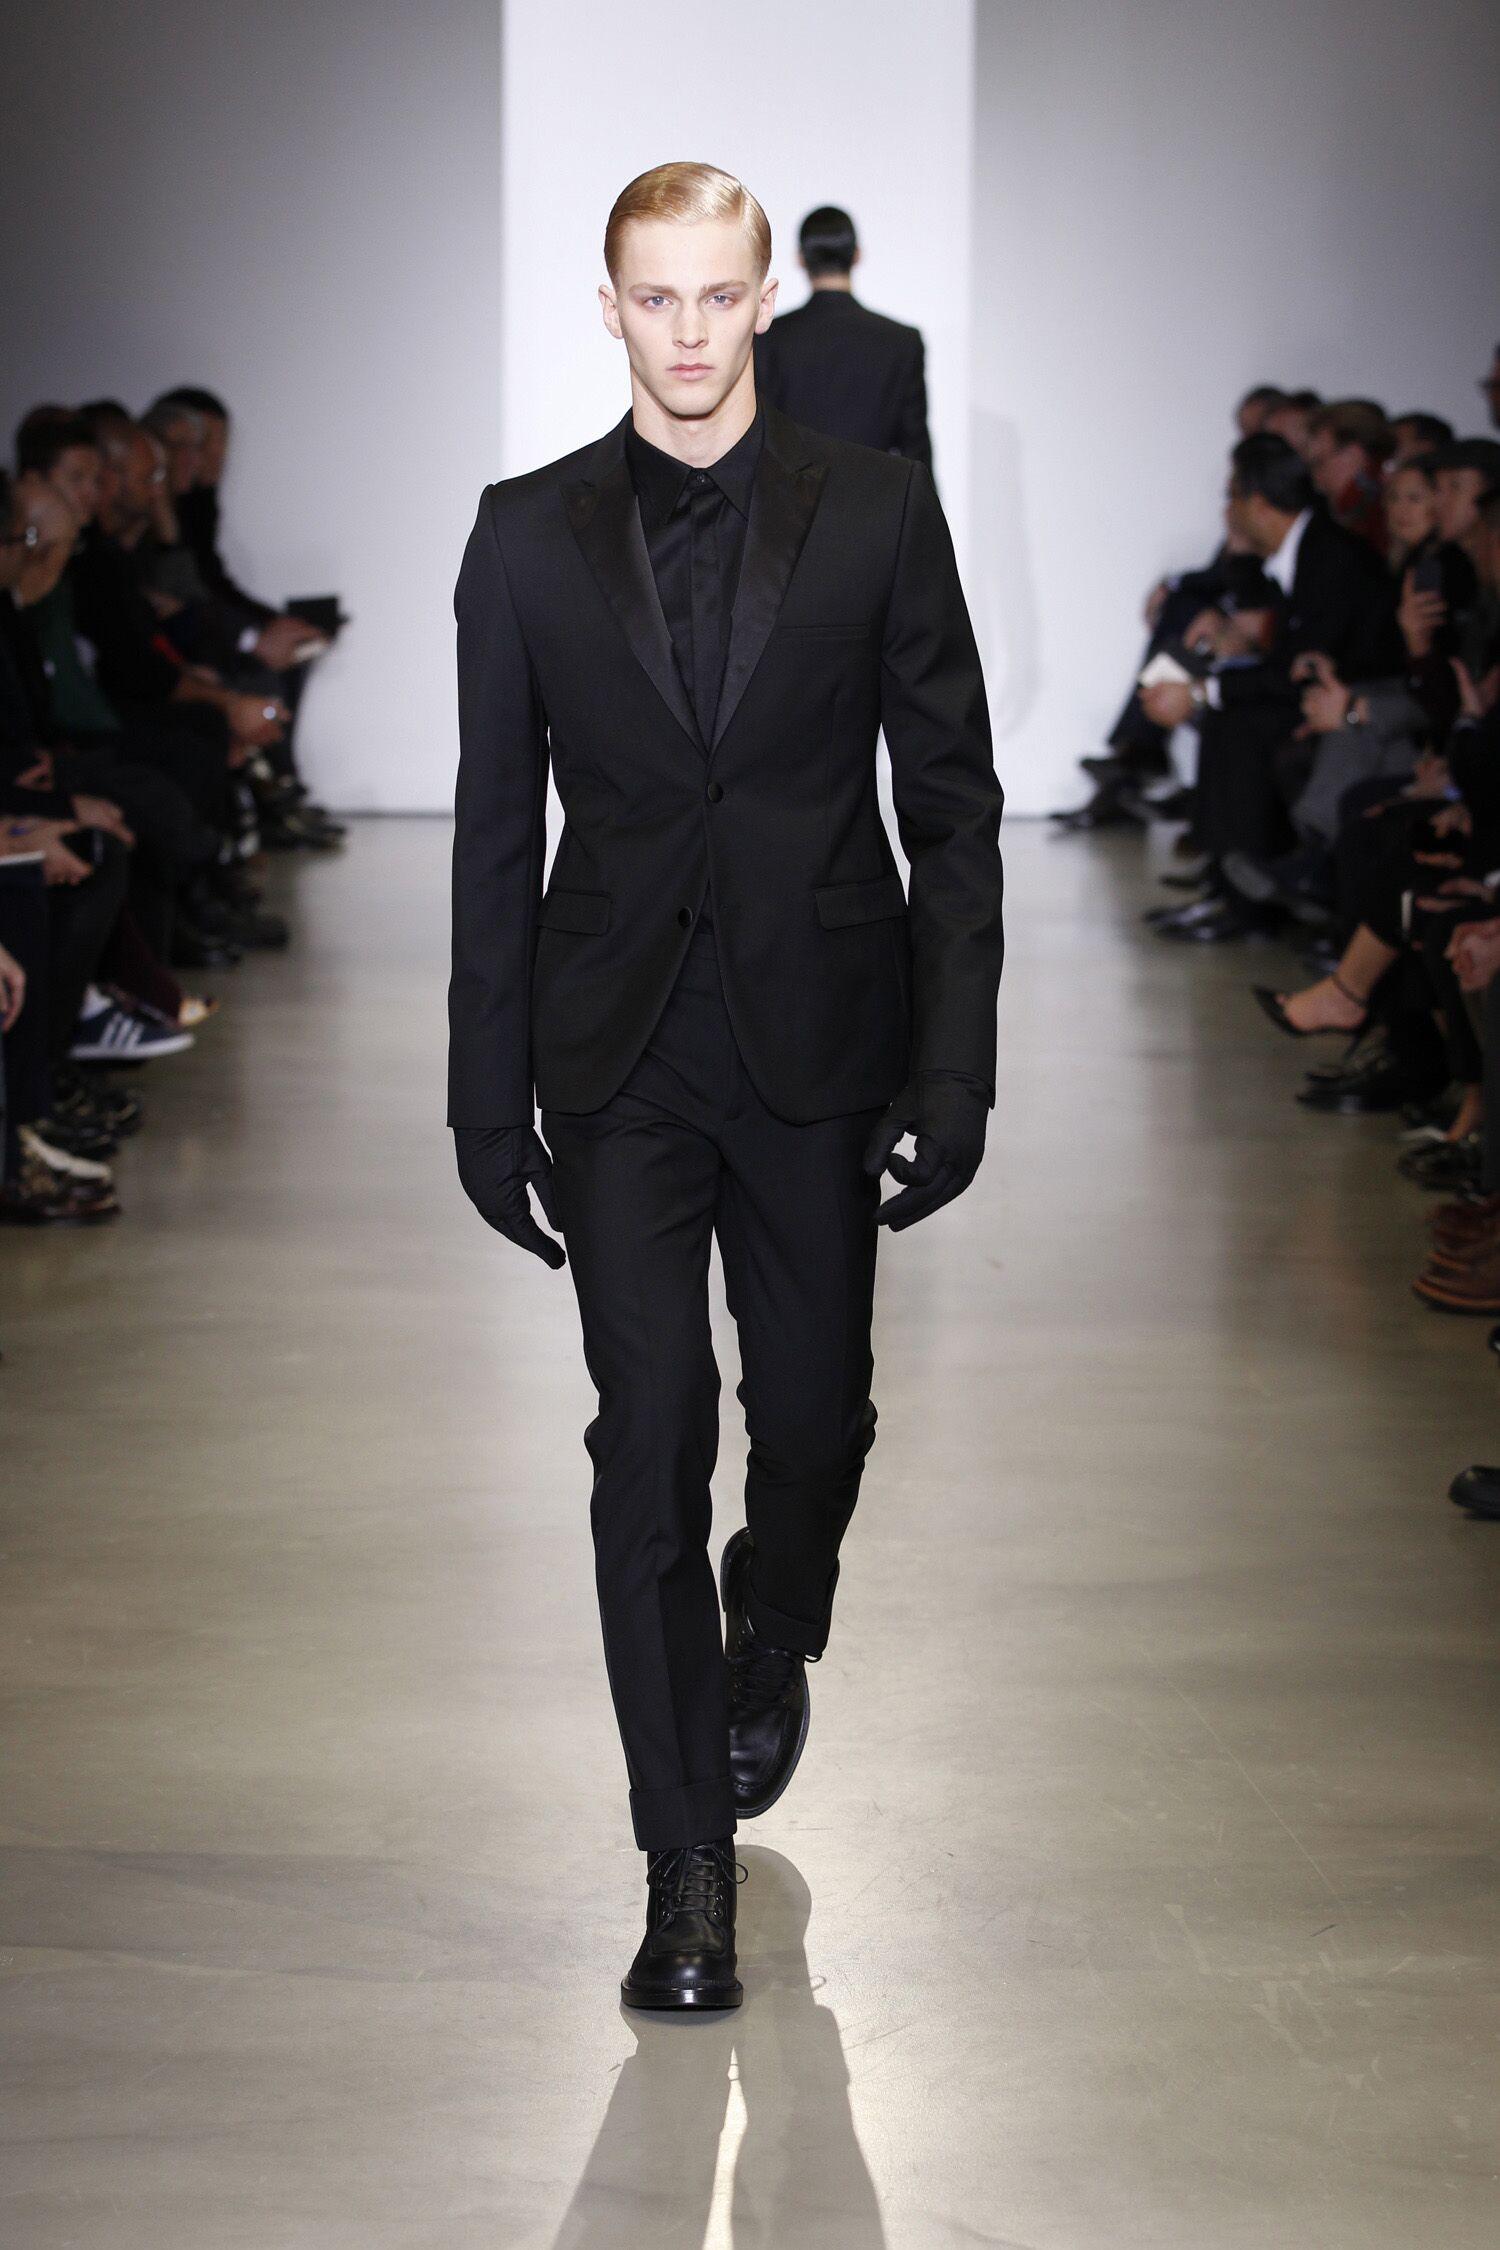 Calvin Klein Suits Men 2014